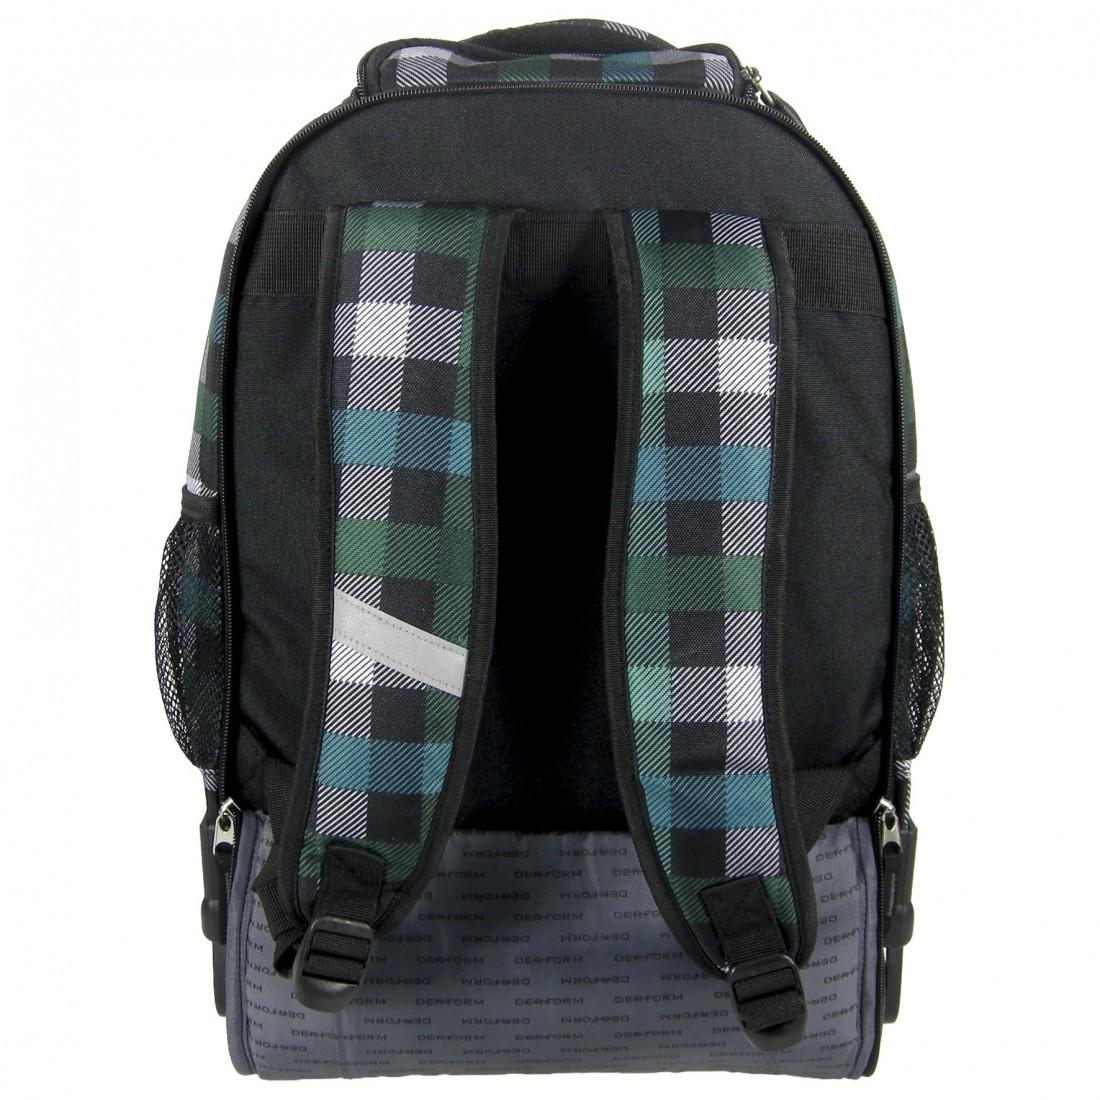 Plecak na Kółkach Zielony w Kratę - plecak-tornister.pl